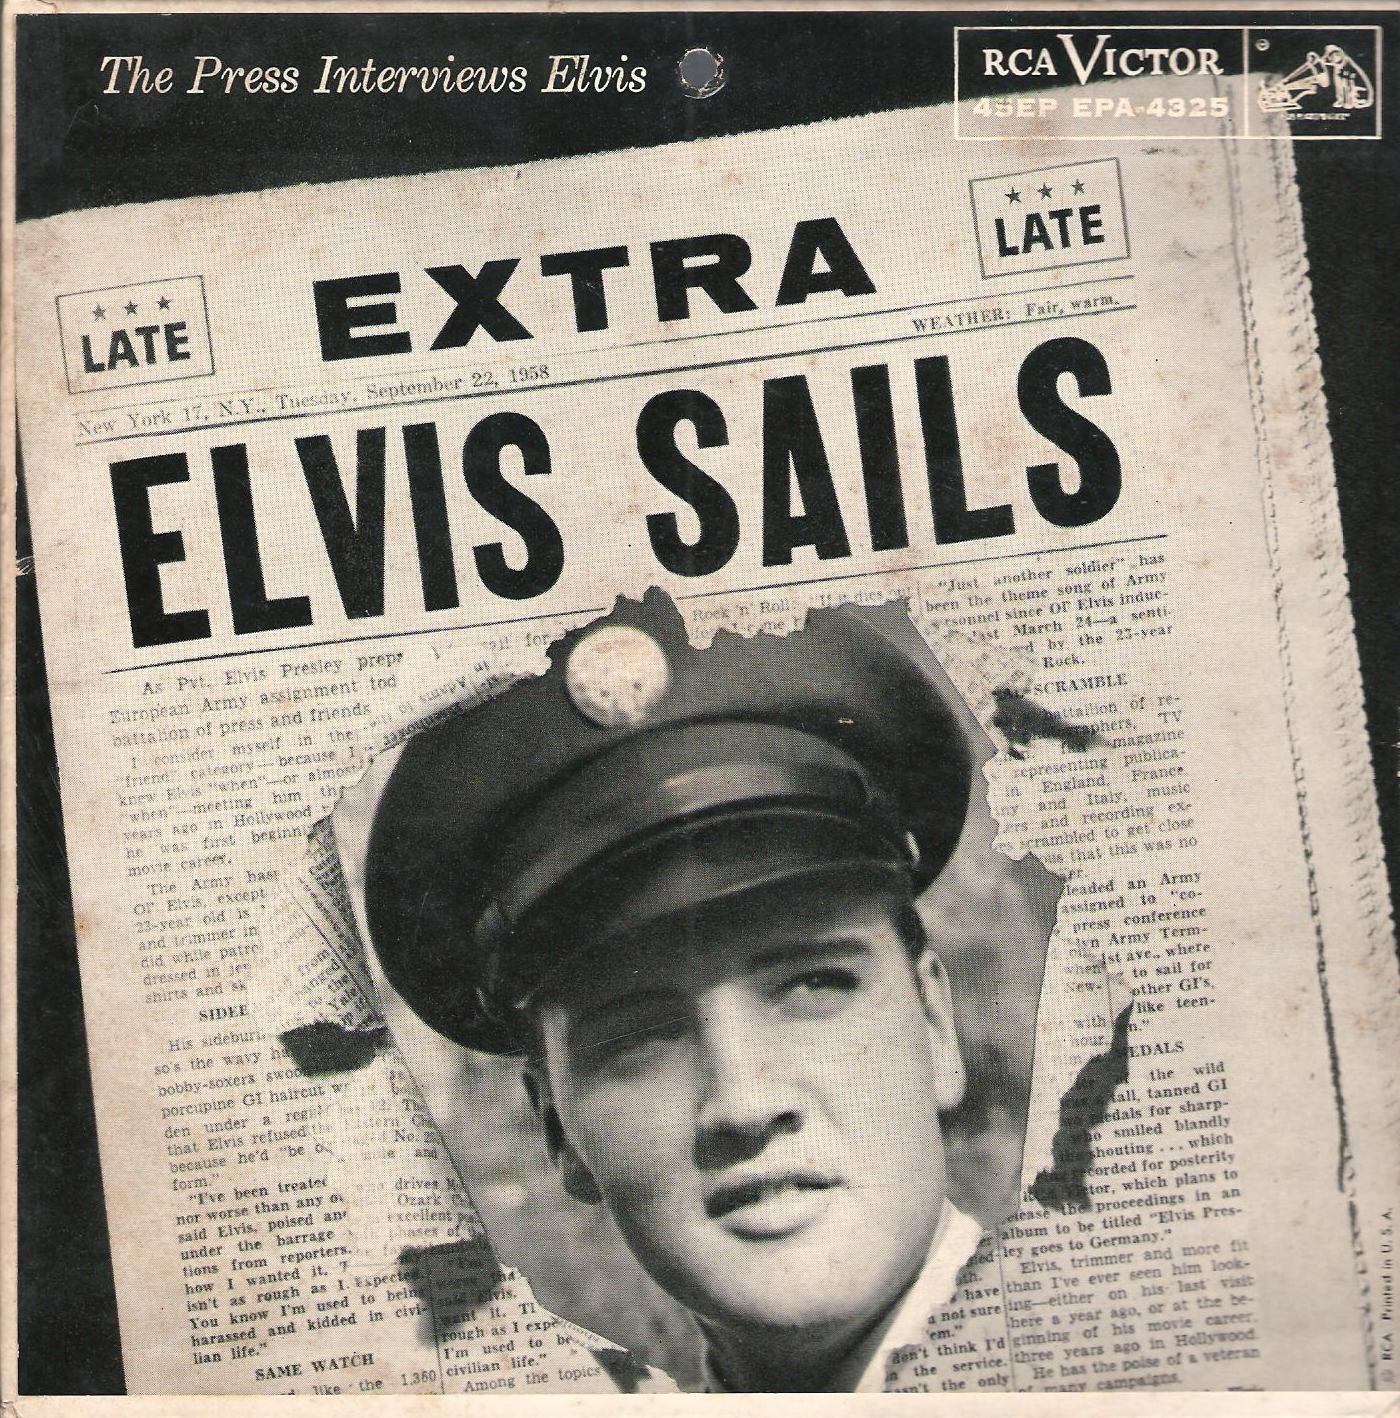 ELVIS SAILS Epa4325av8amn